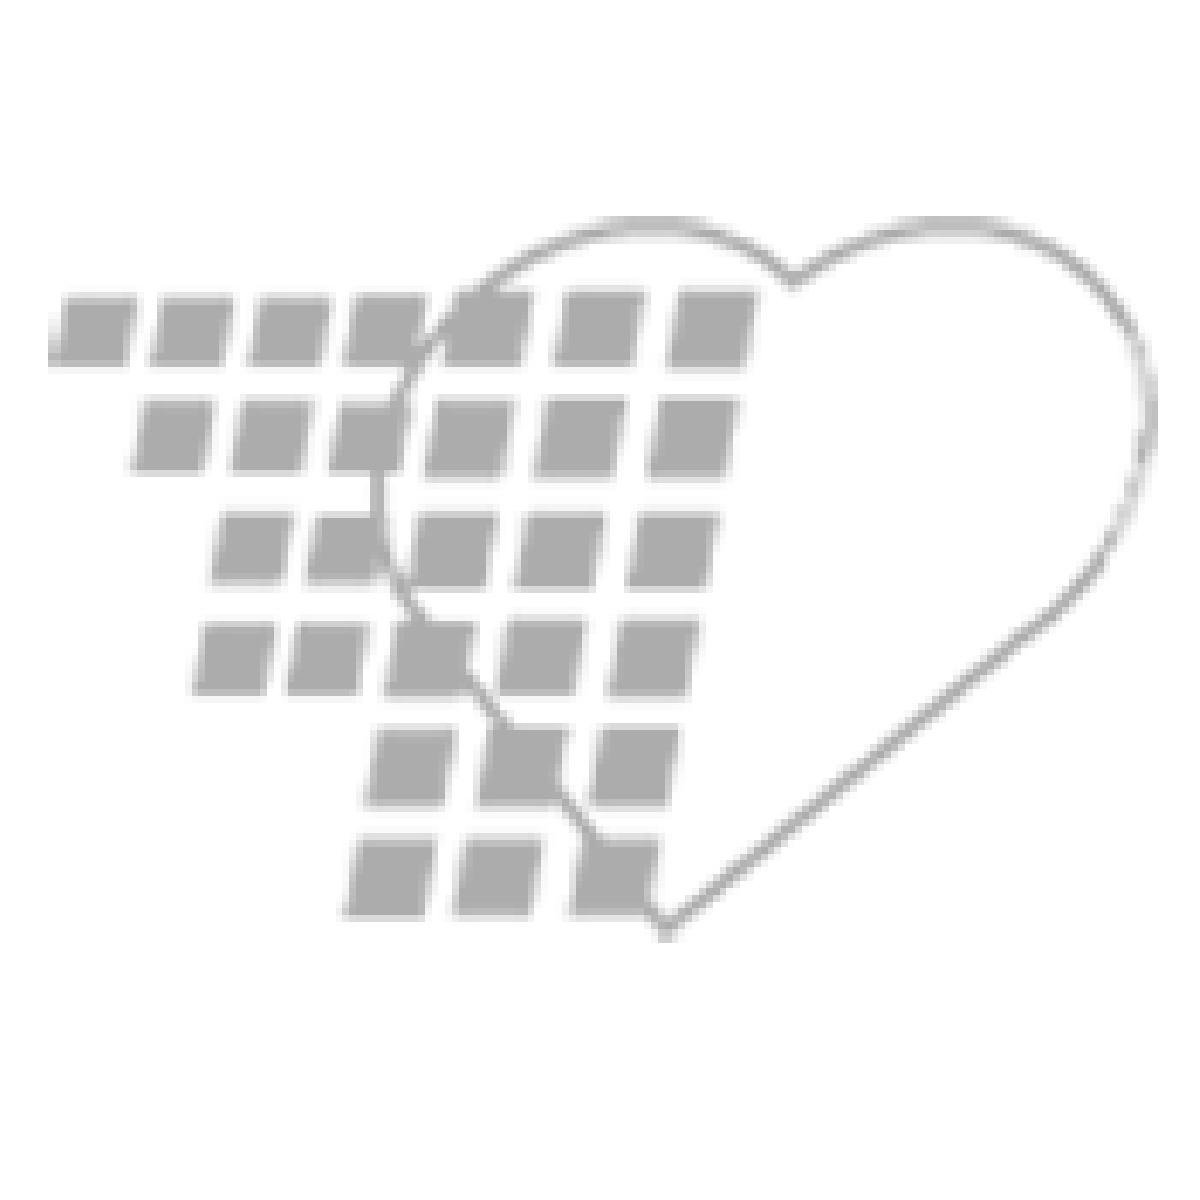 03-04-8804 Dial Regular Antimicrobial Soap - 1 Gallon